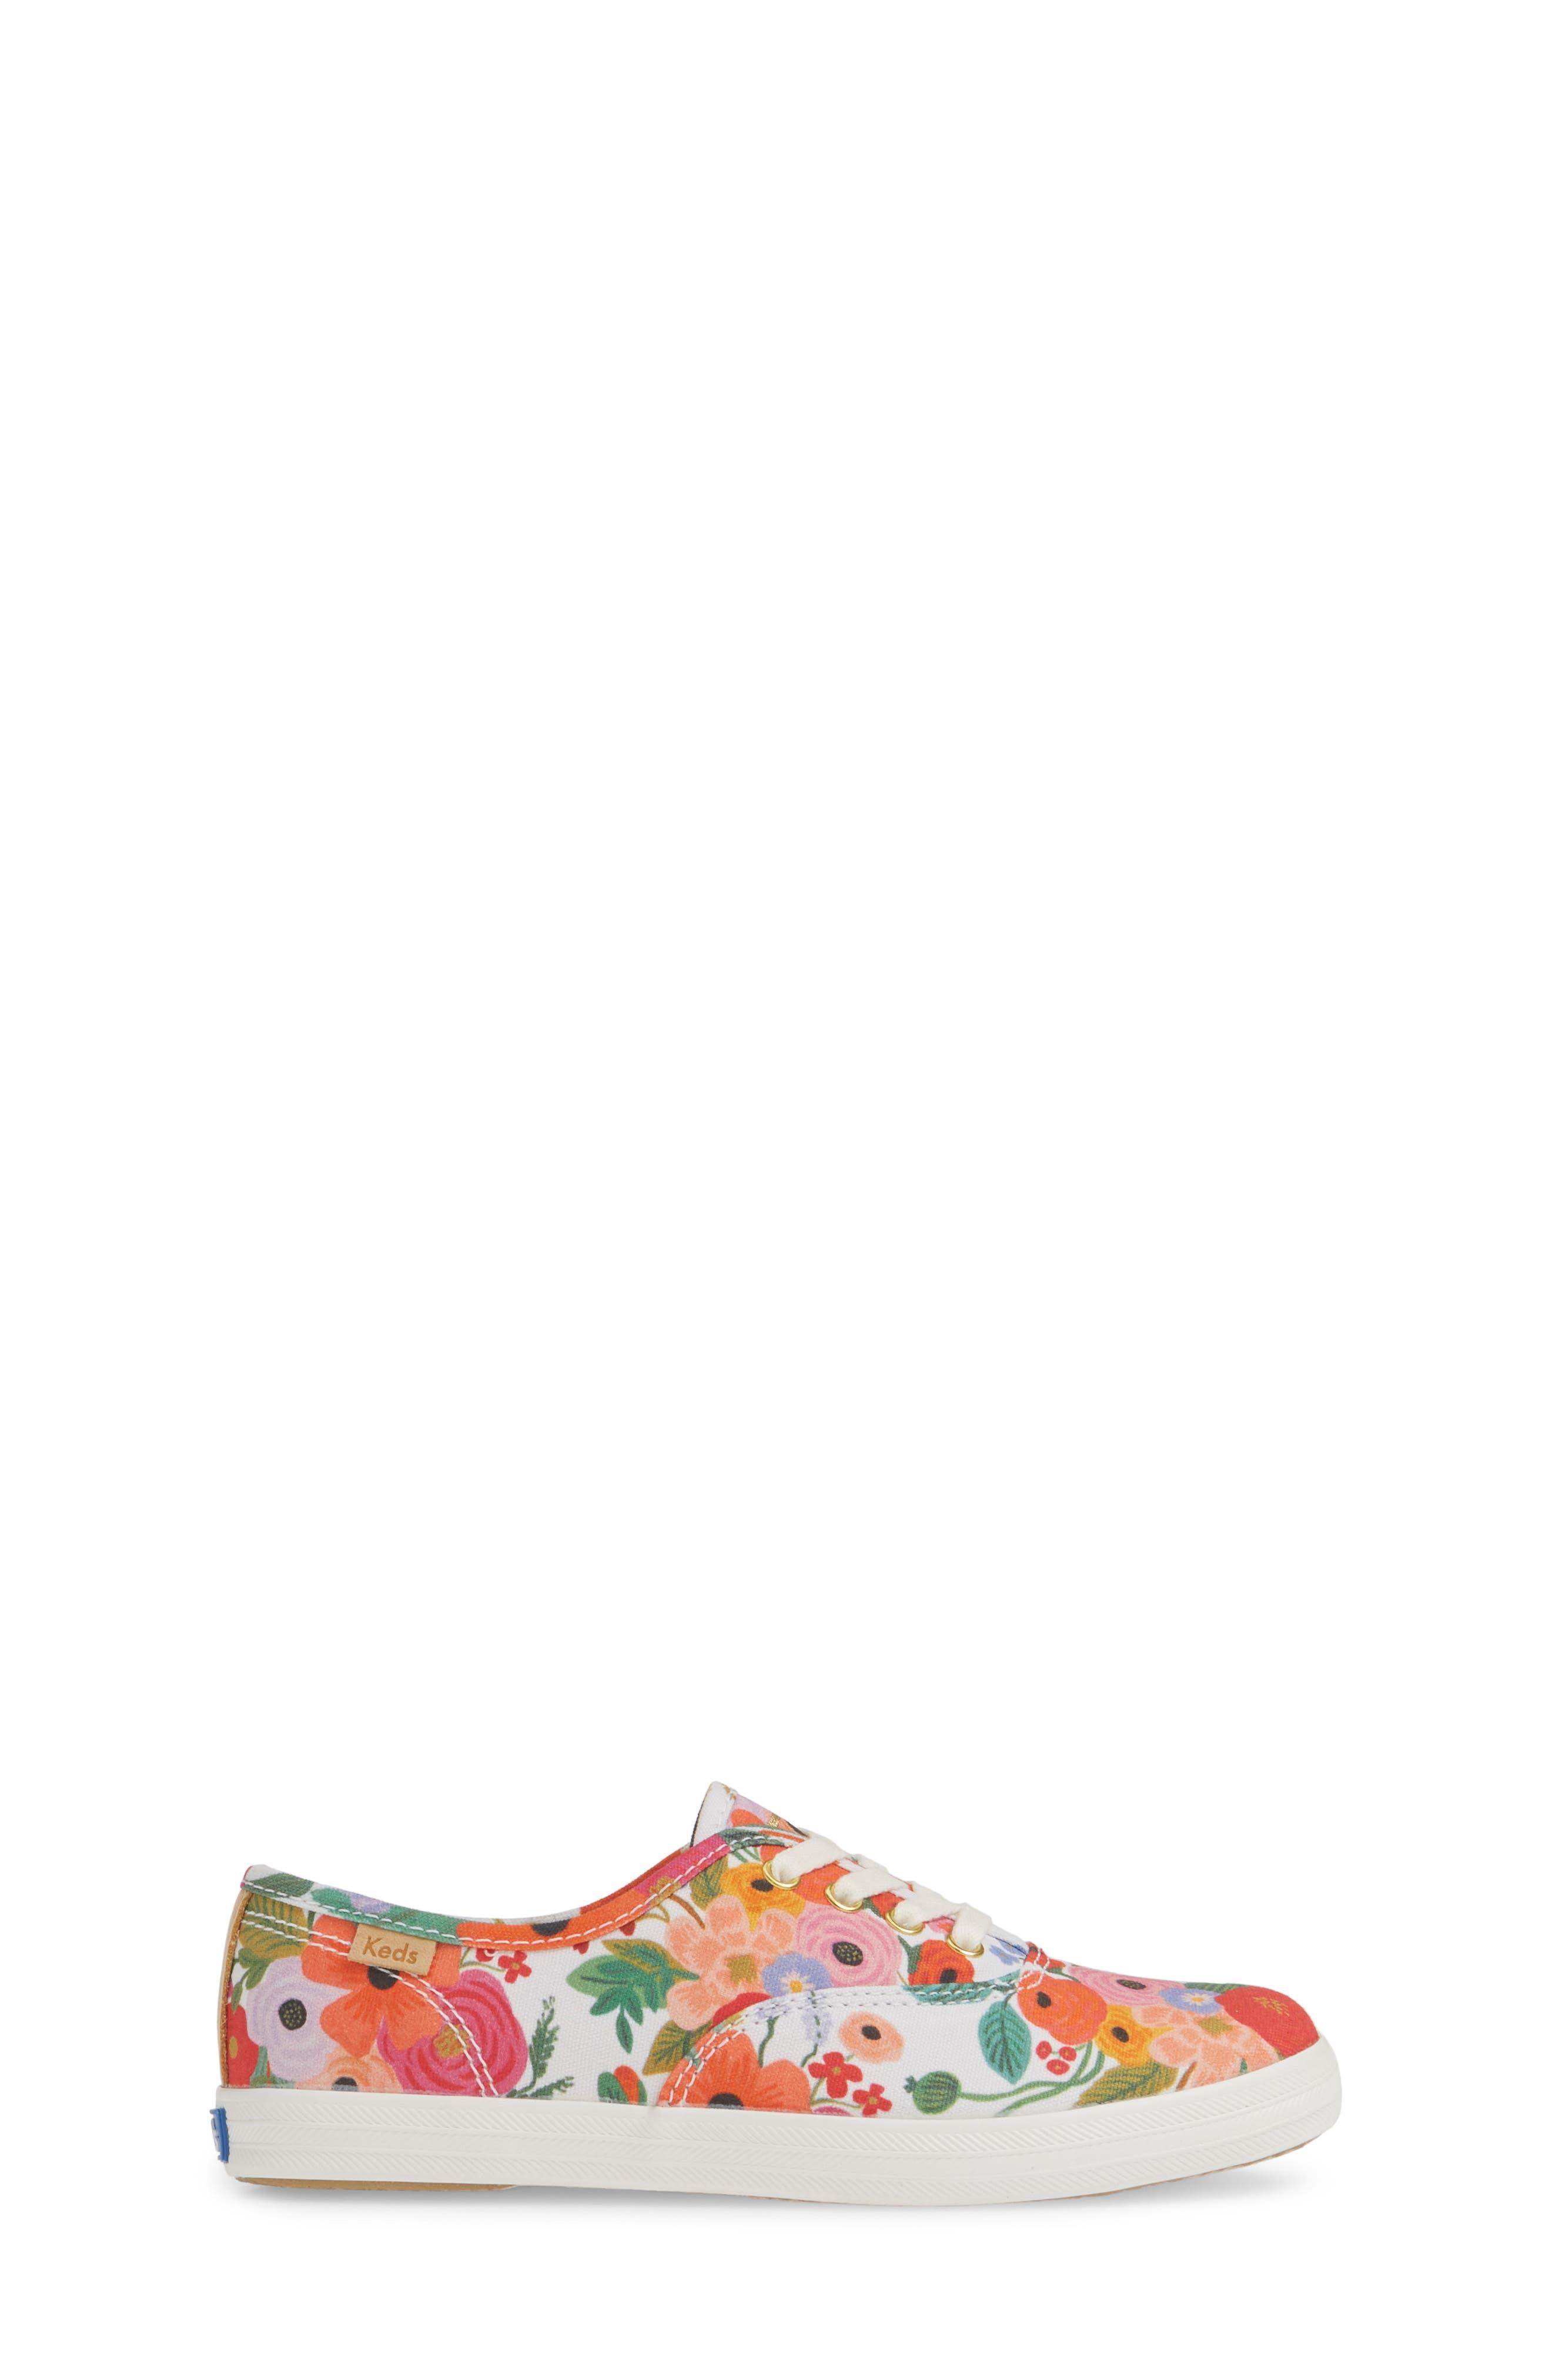 KEDS<SUP>®</SUP>, x Rifle Paper Co. Floral Print Champion Sneaker, Alternate thumbnail 3, color, GARDEN PARTY